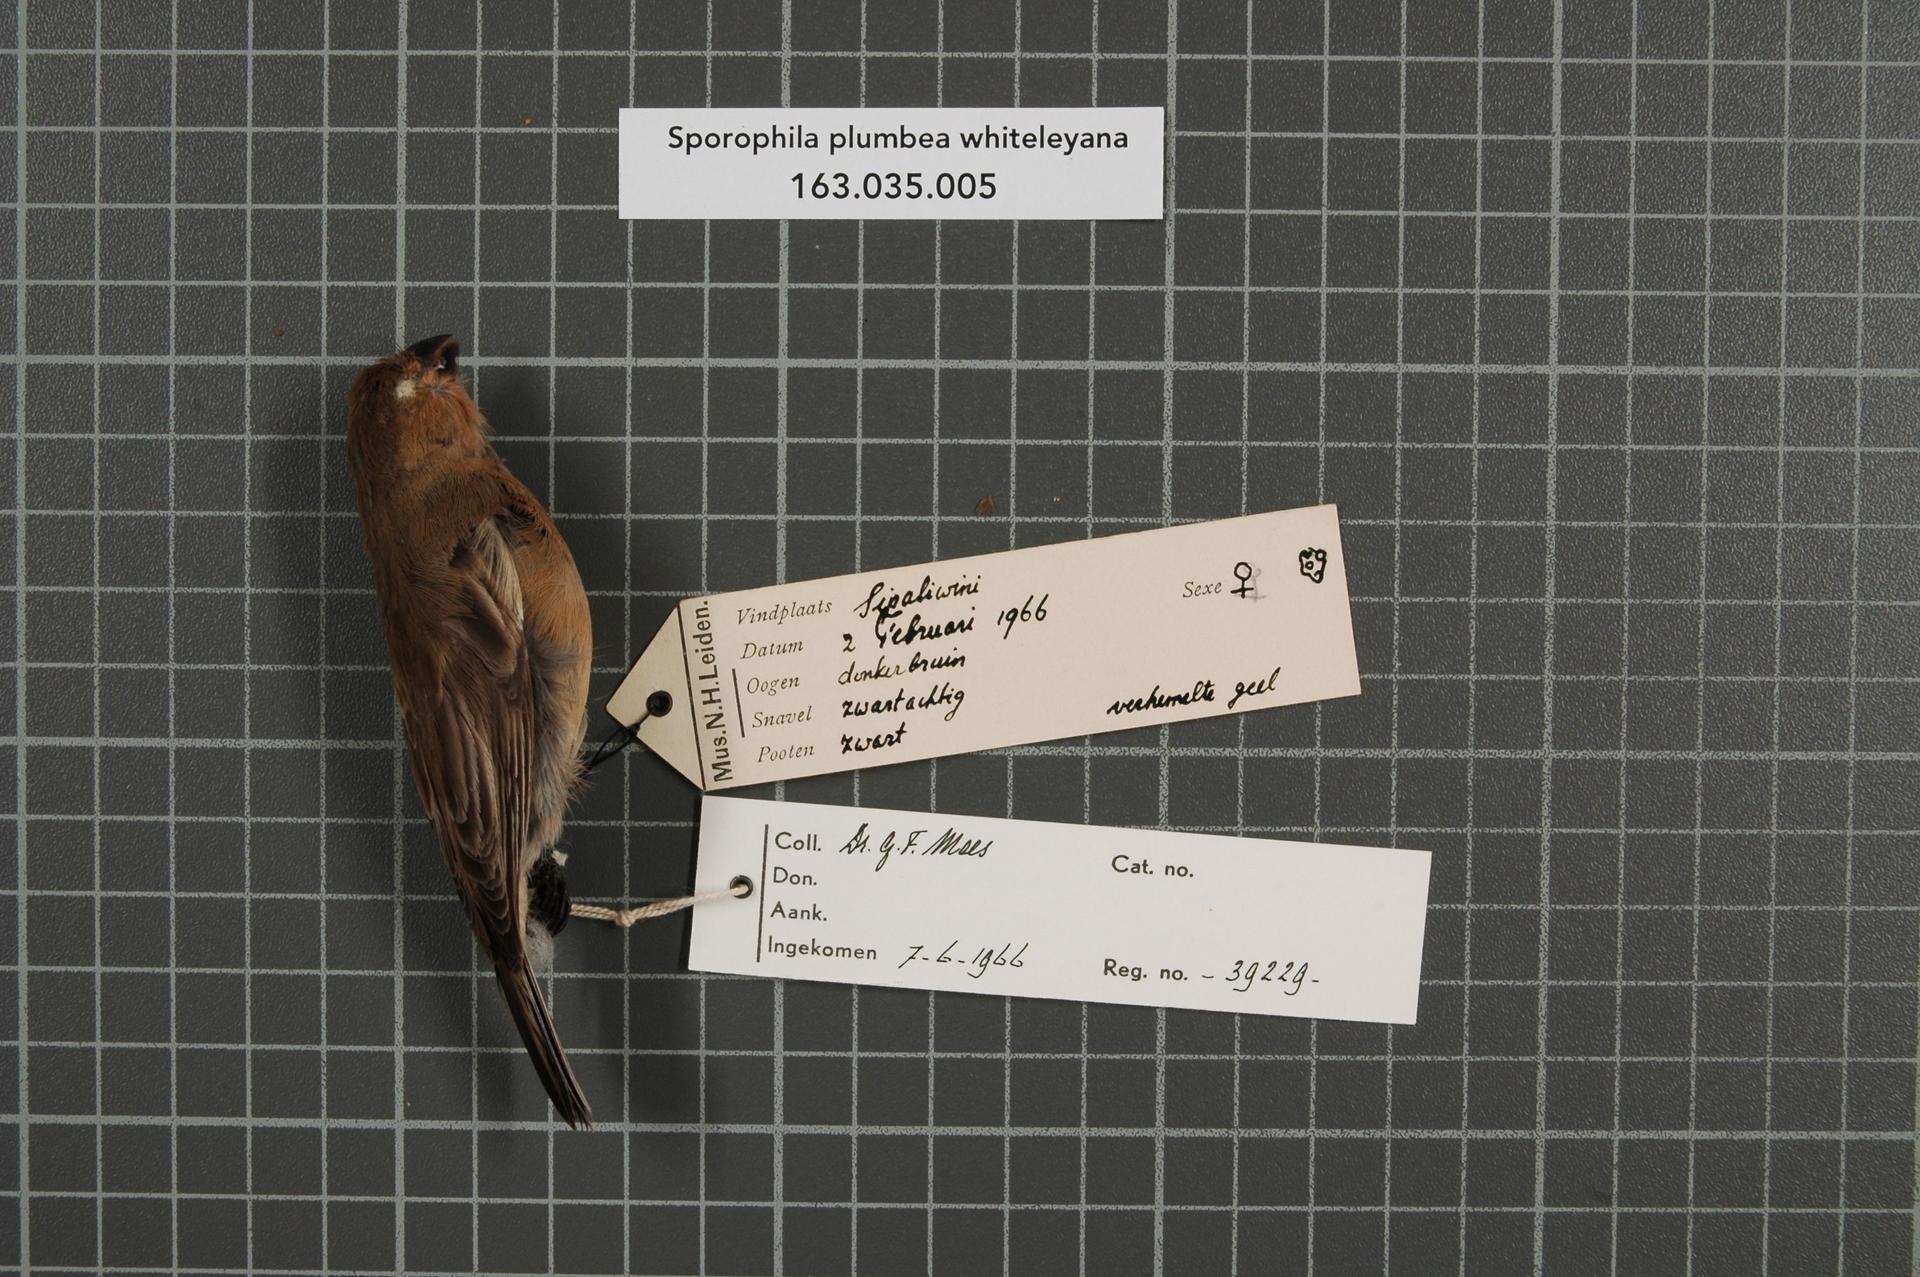 RMNH.AVES.39229 | Sporophila plumbea whiteleyana (Sharpe, 1888)